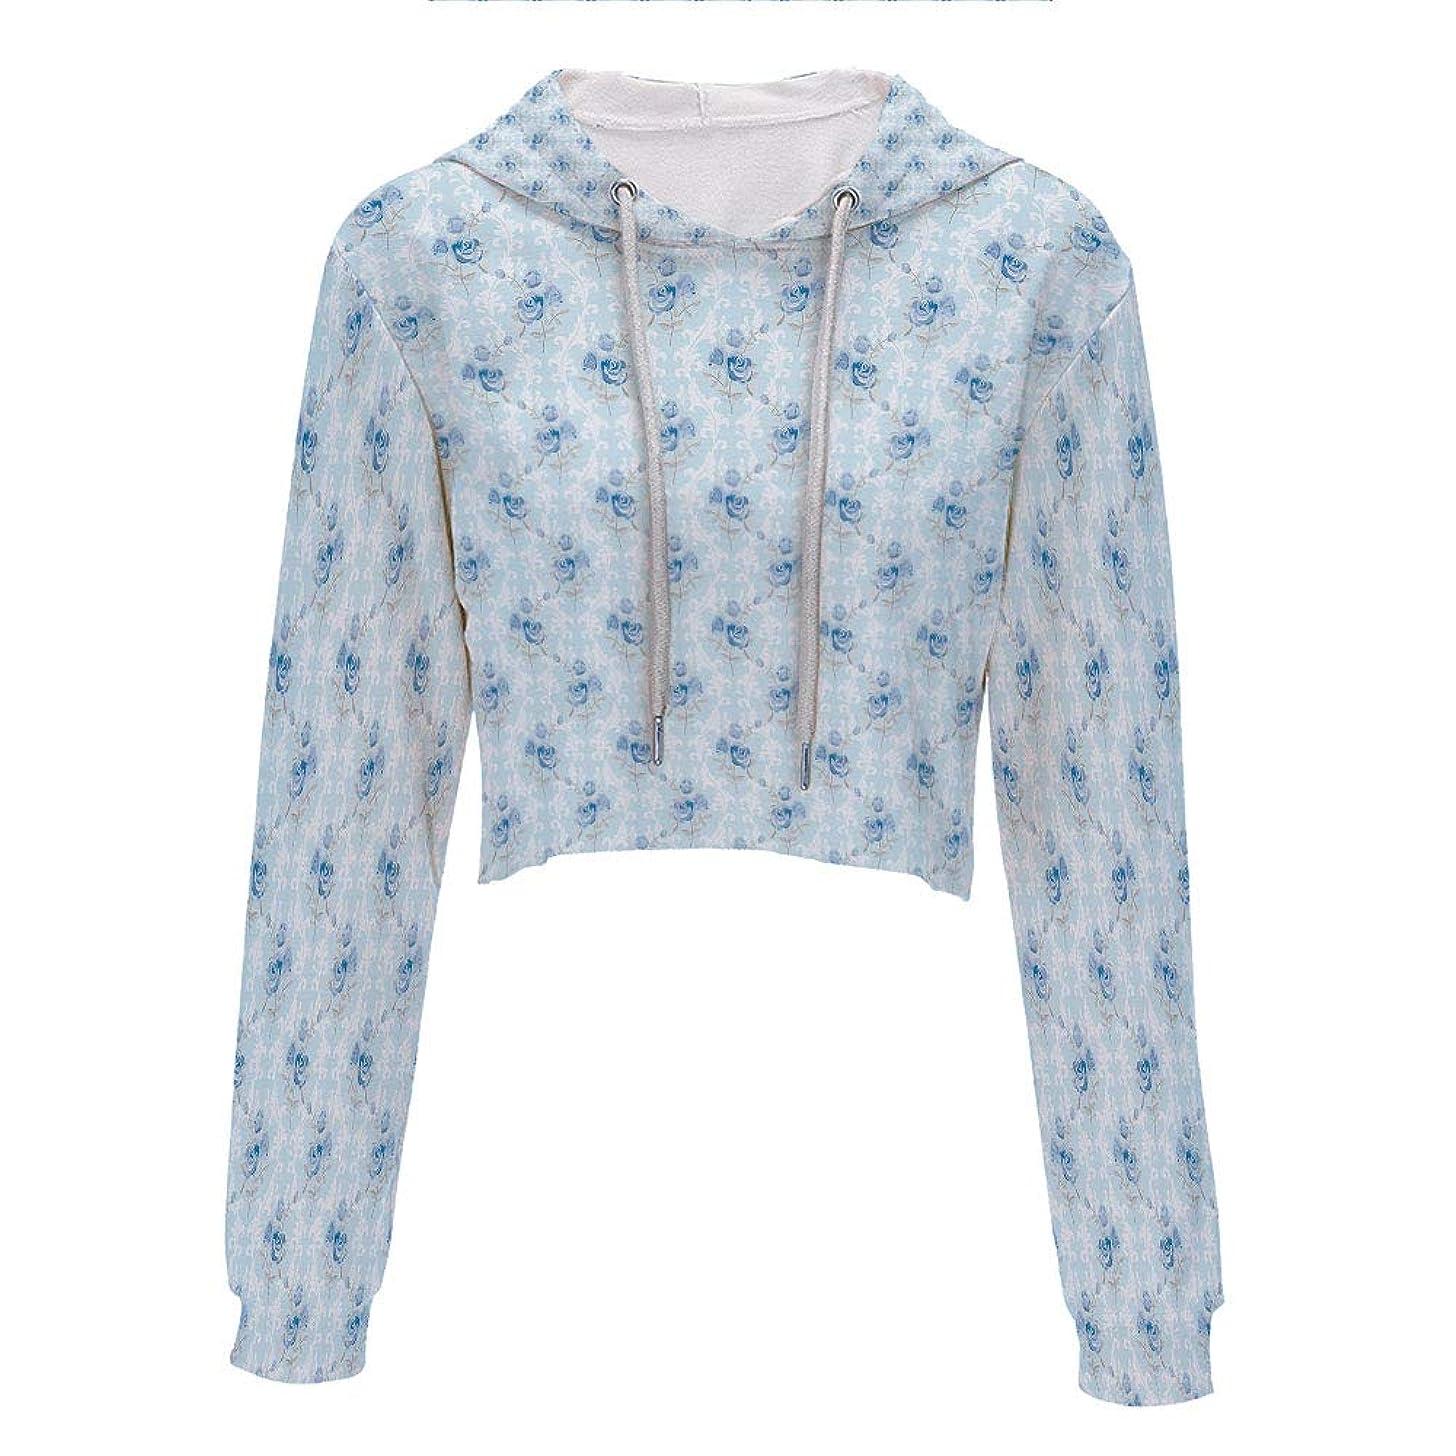 Hooded Sweatshirt Hip hop Clothing for Women S/M Light Blue WhiteClassic Polka